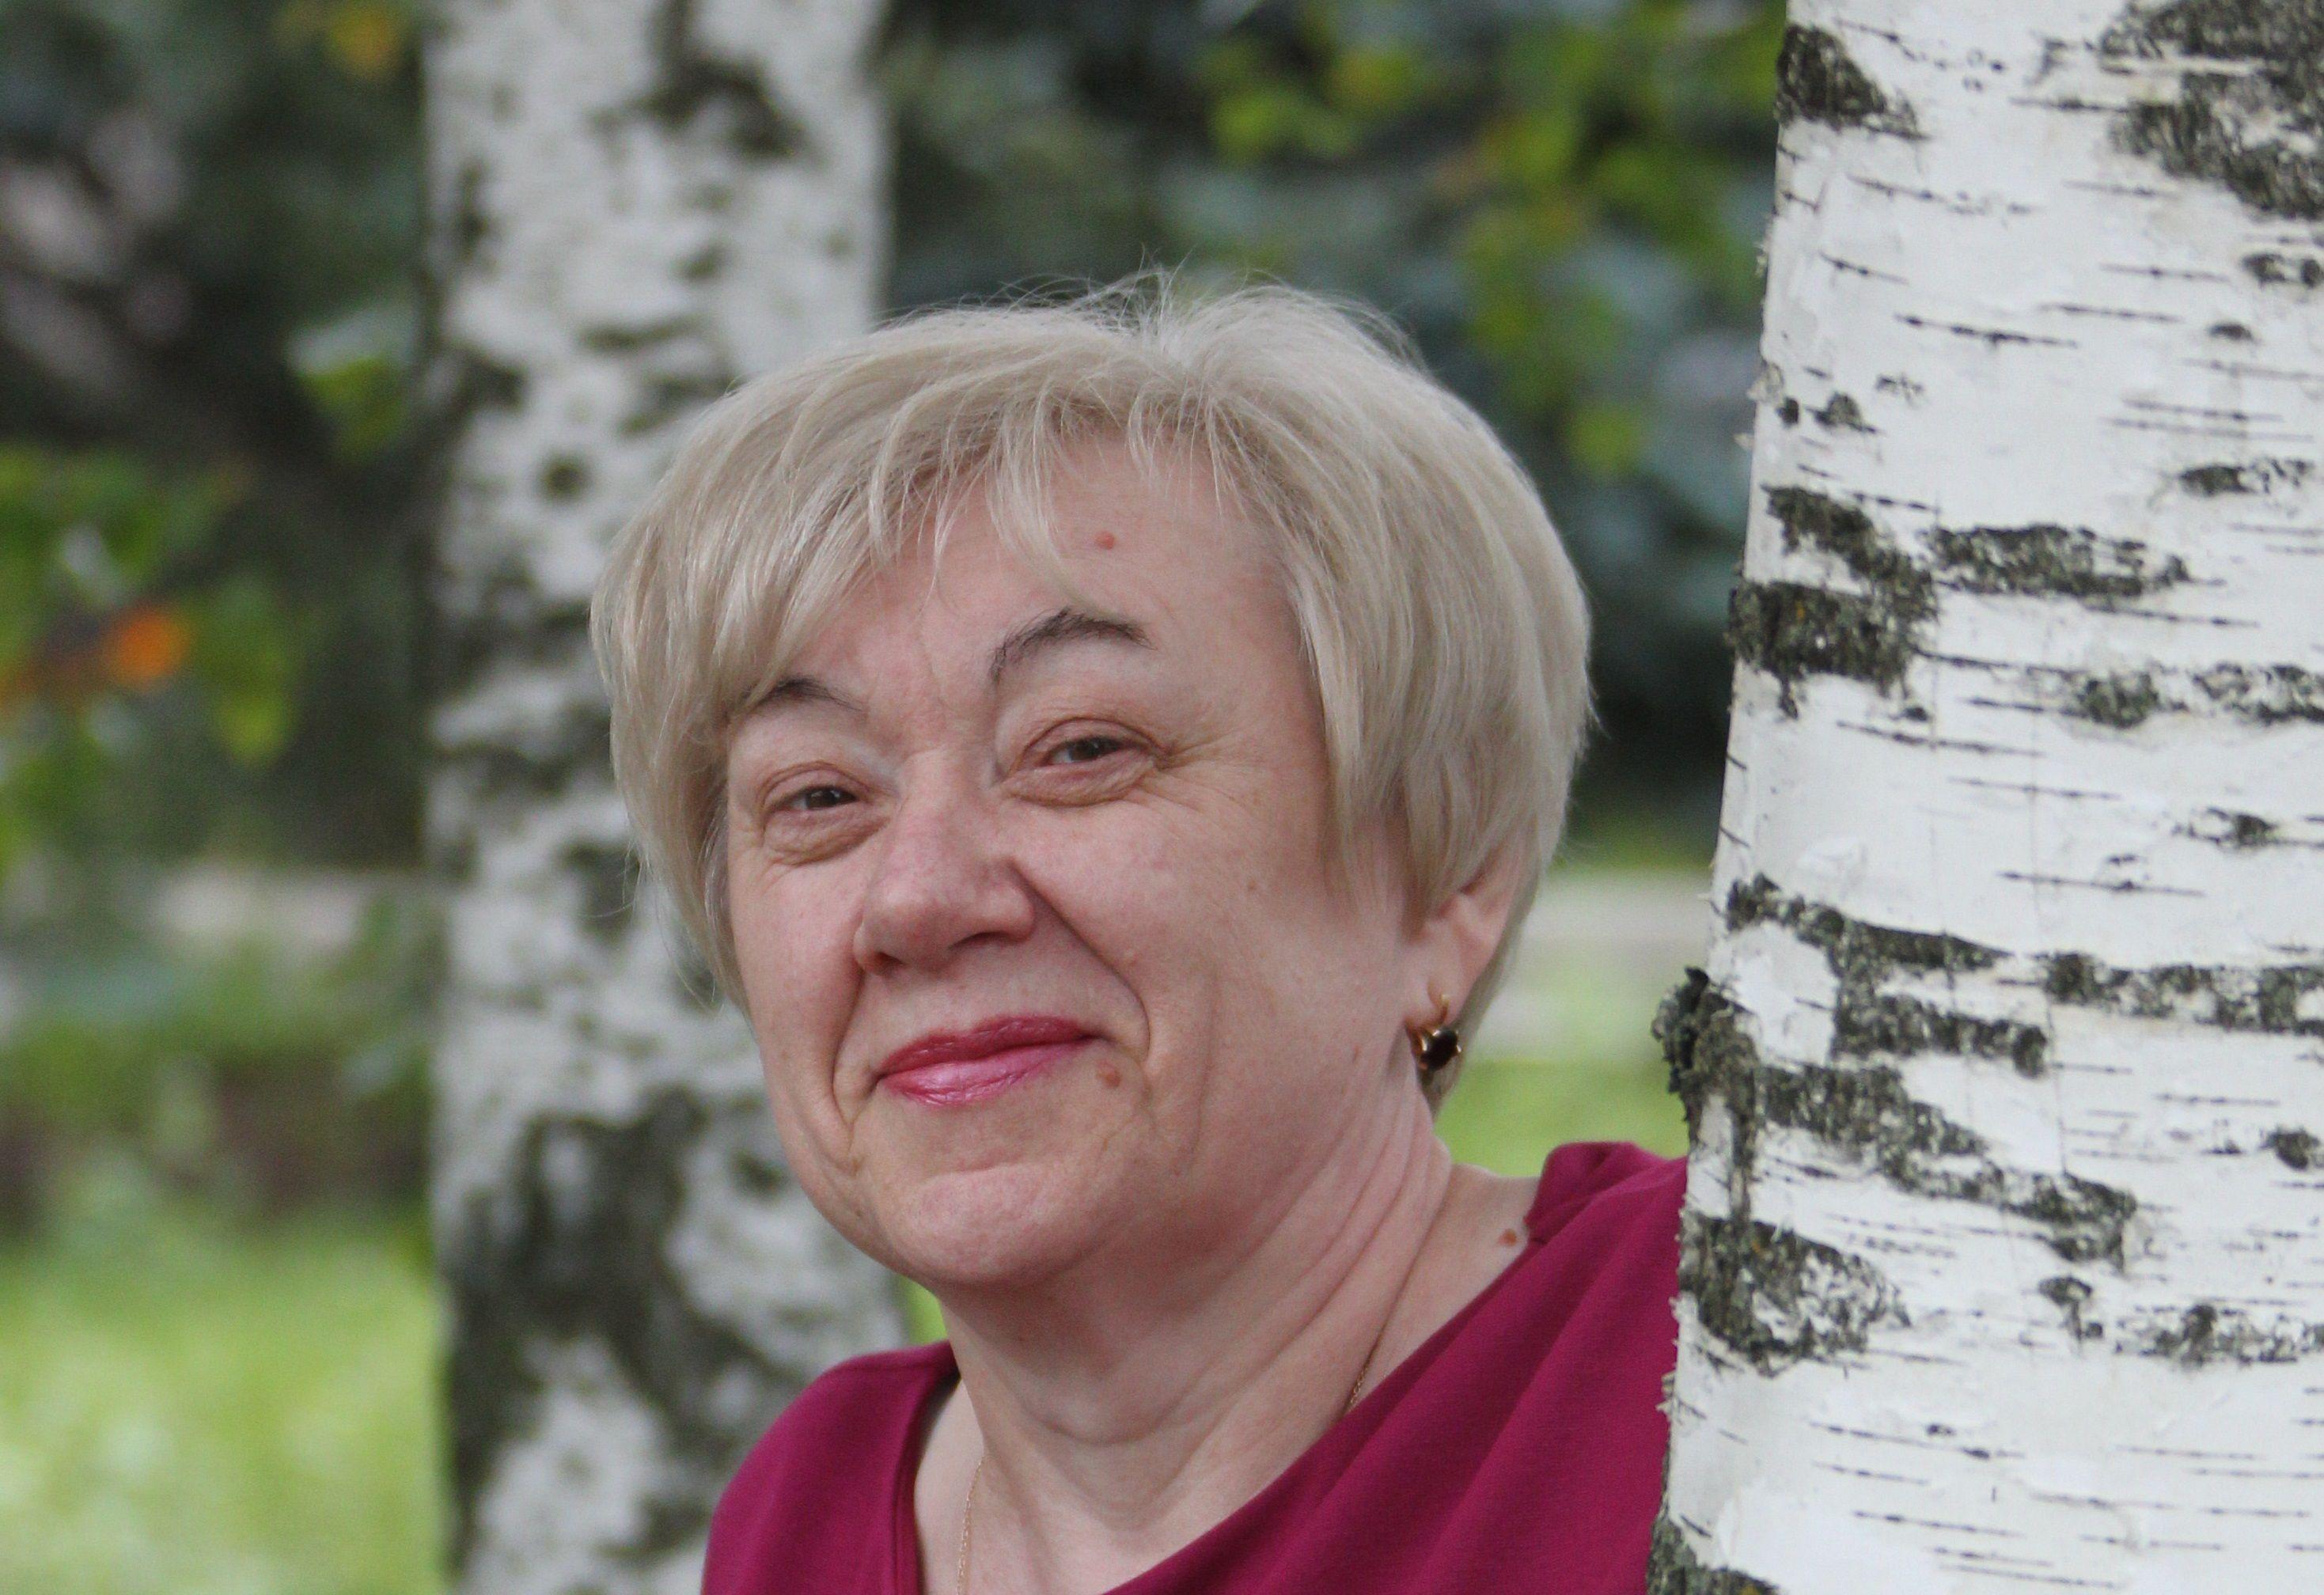 Тетя Нина, душа магазина